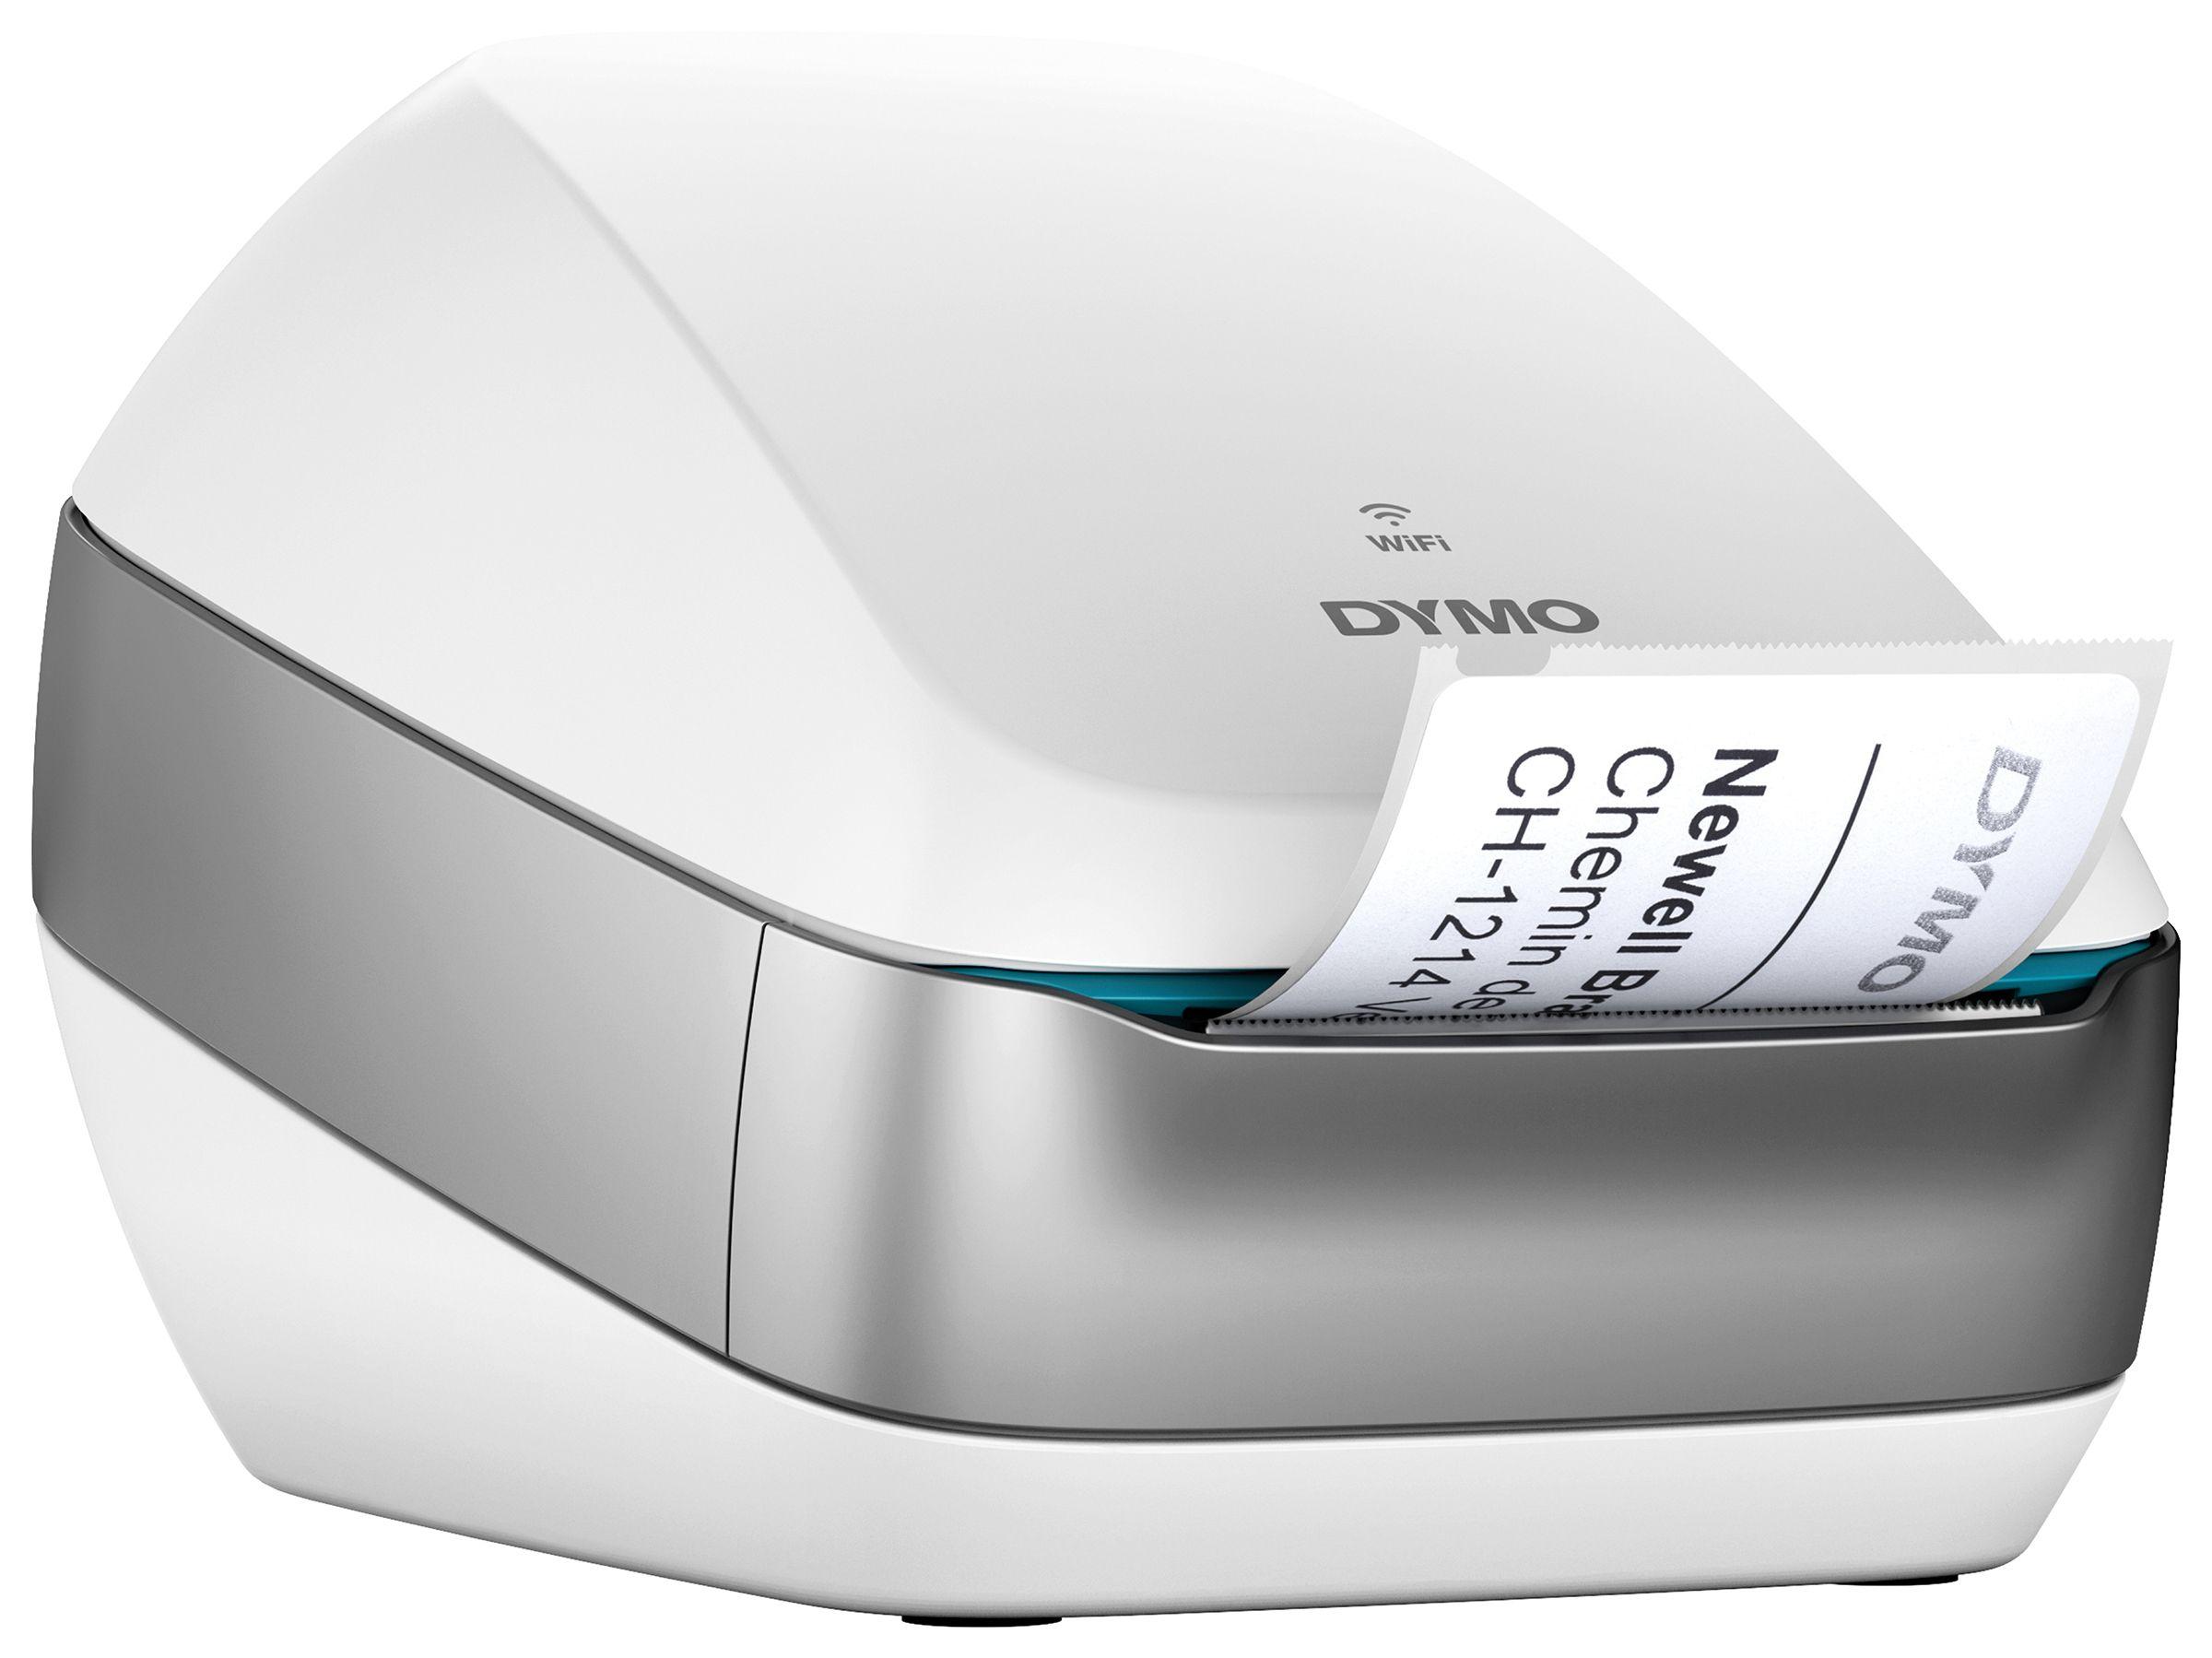 Labelwriter, Dymo etikettmaskin, trådløse, hvit, stk 1980563